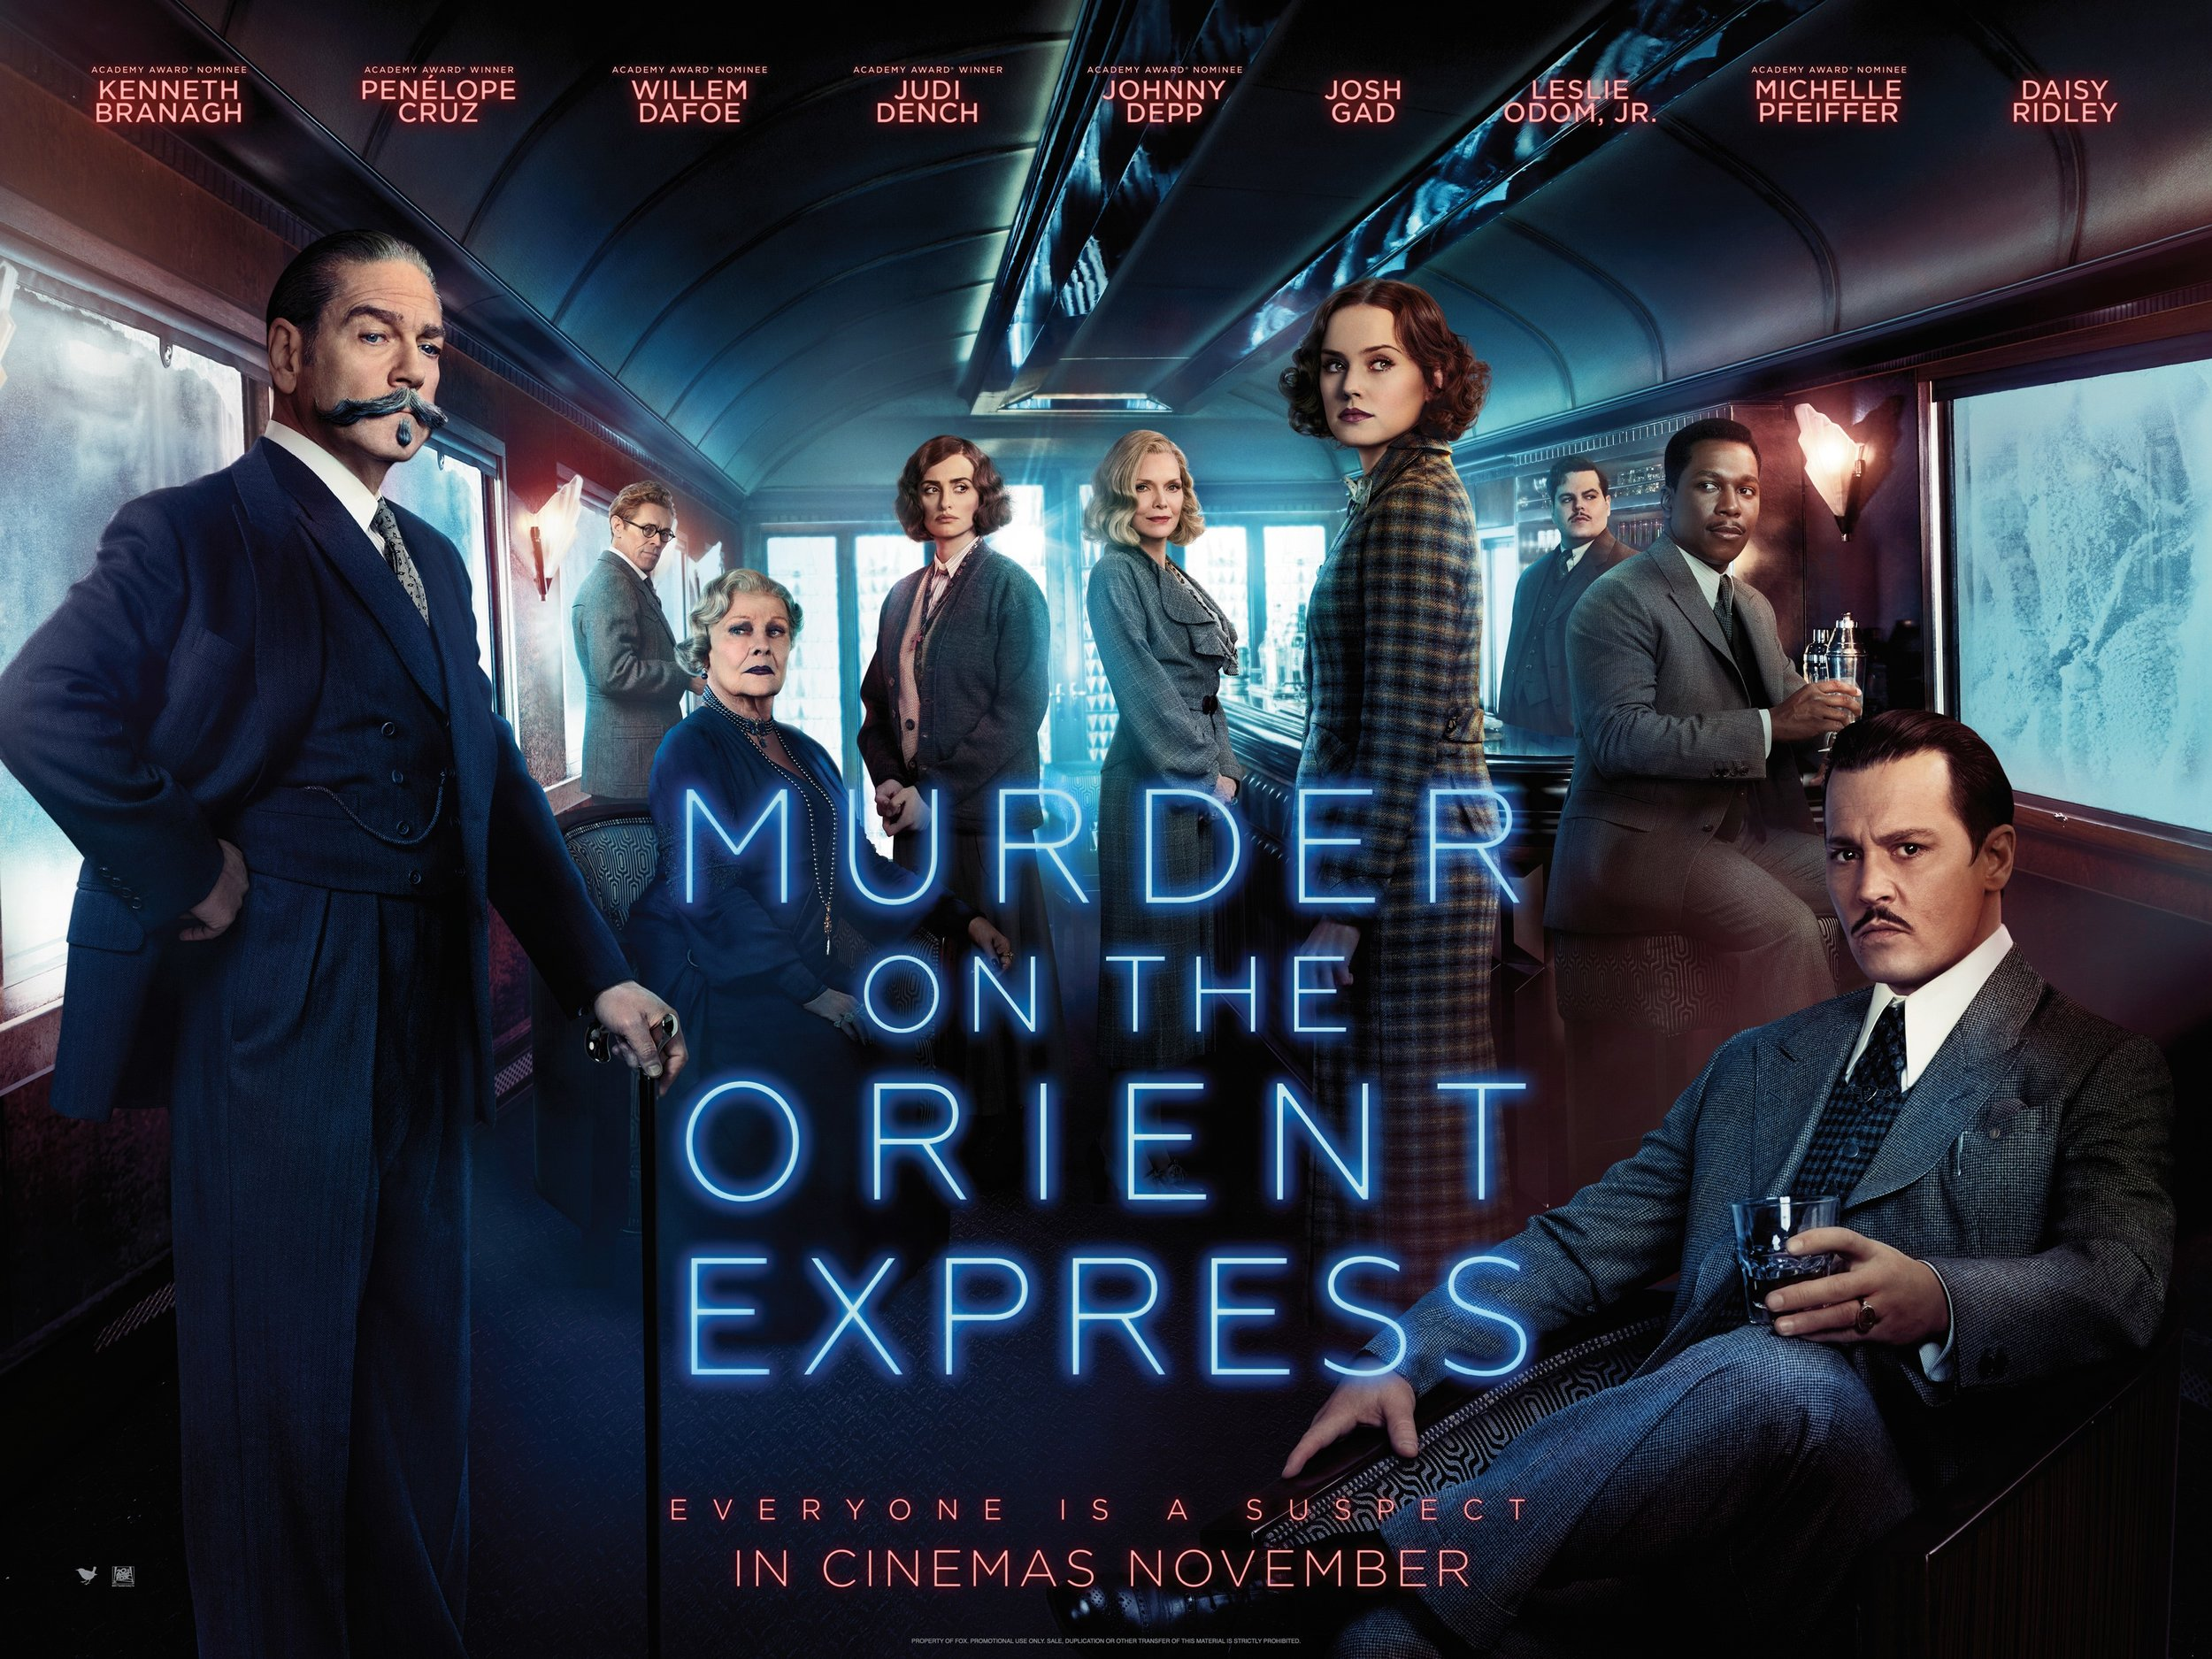 murder-on-the-orient-express-launch-quad.jpg